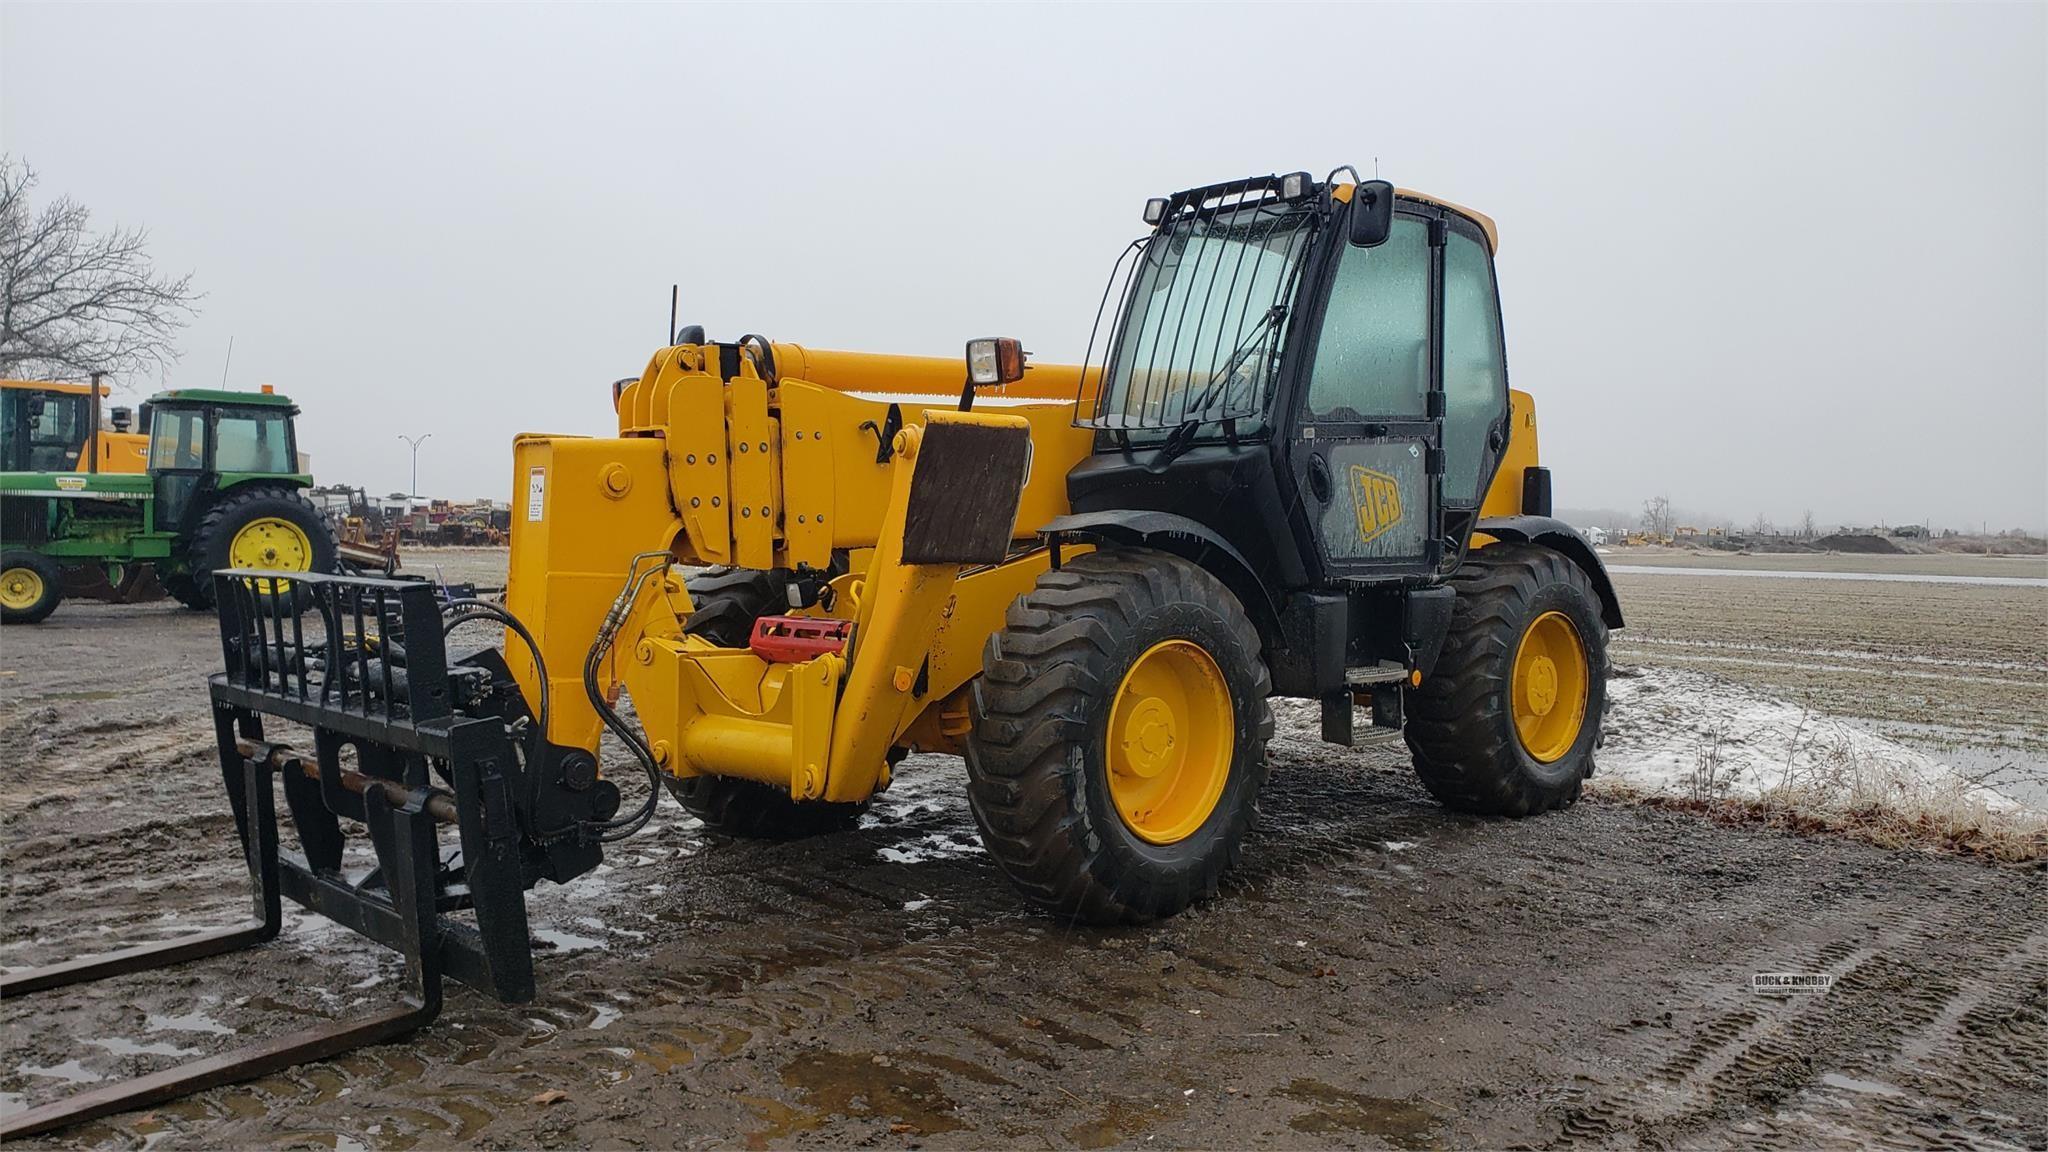 2006 JCB 550-170 For Sale in Ottawa Lake, Michigan